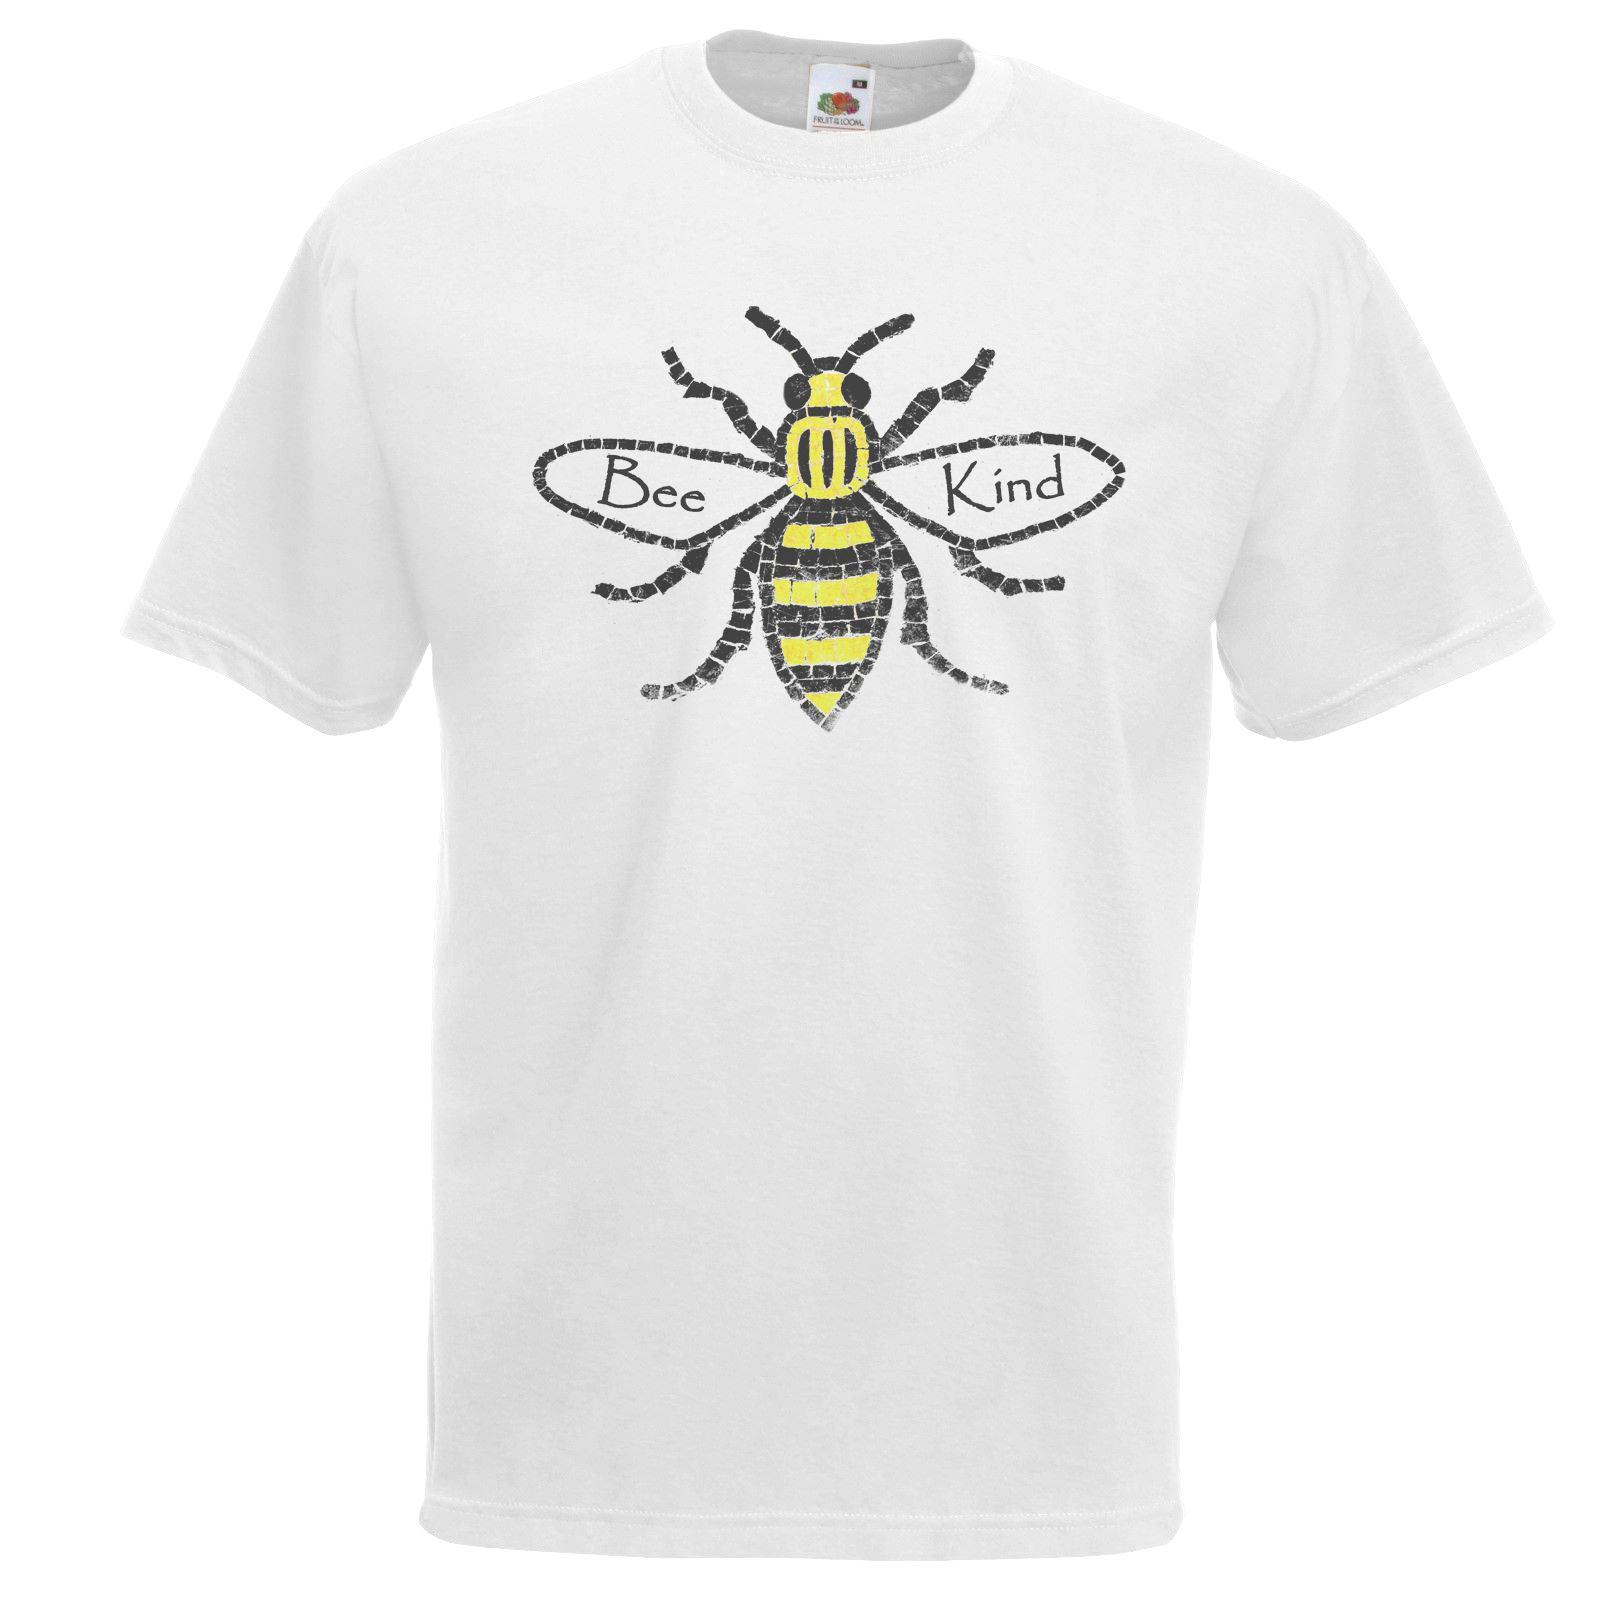 Ladies Black Manchester Worker Bee T-Shirt Shirt Community Save Environment